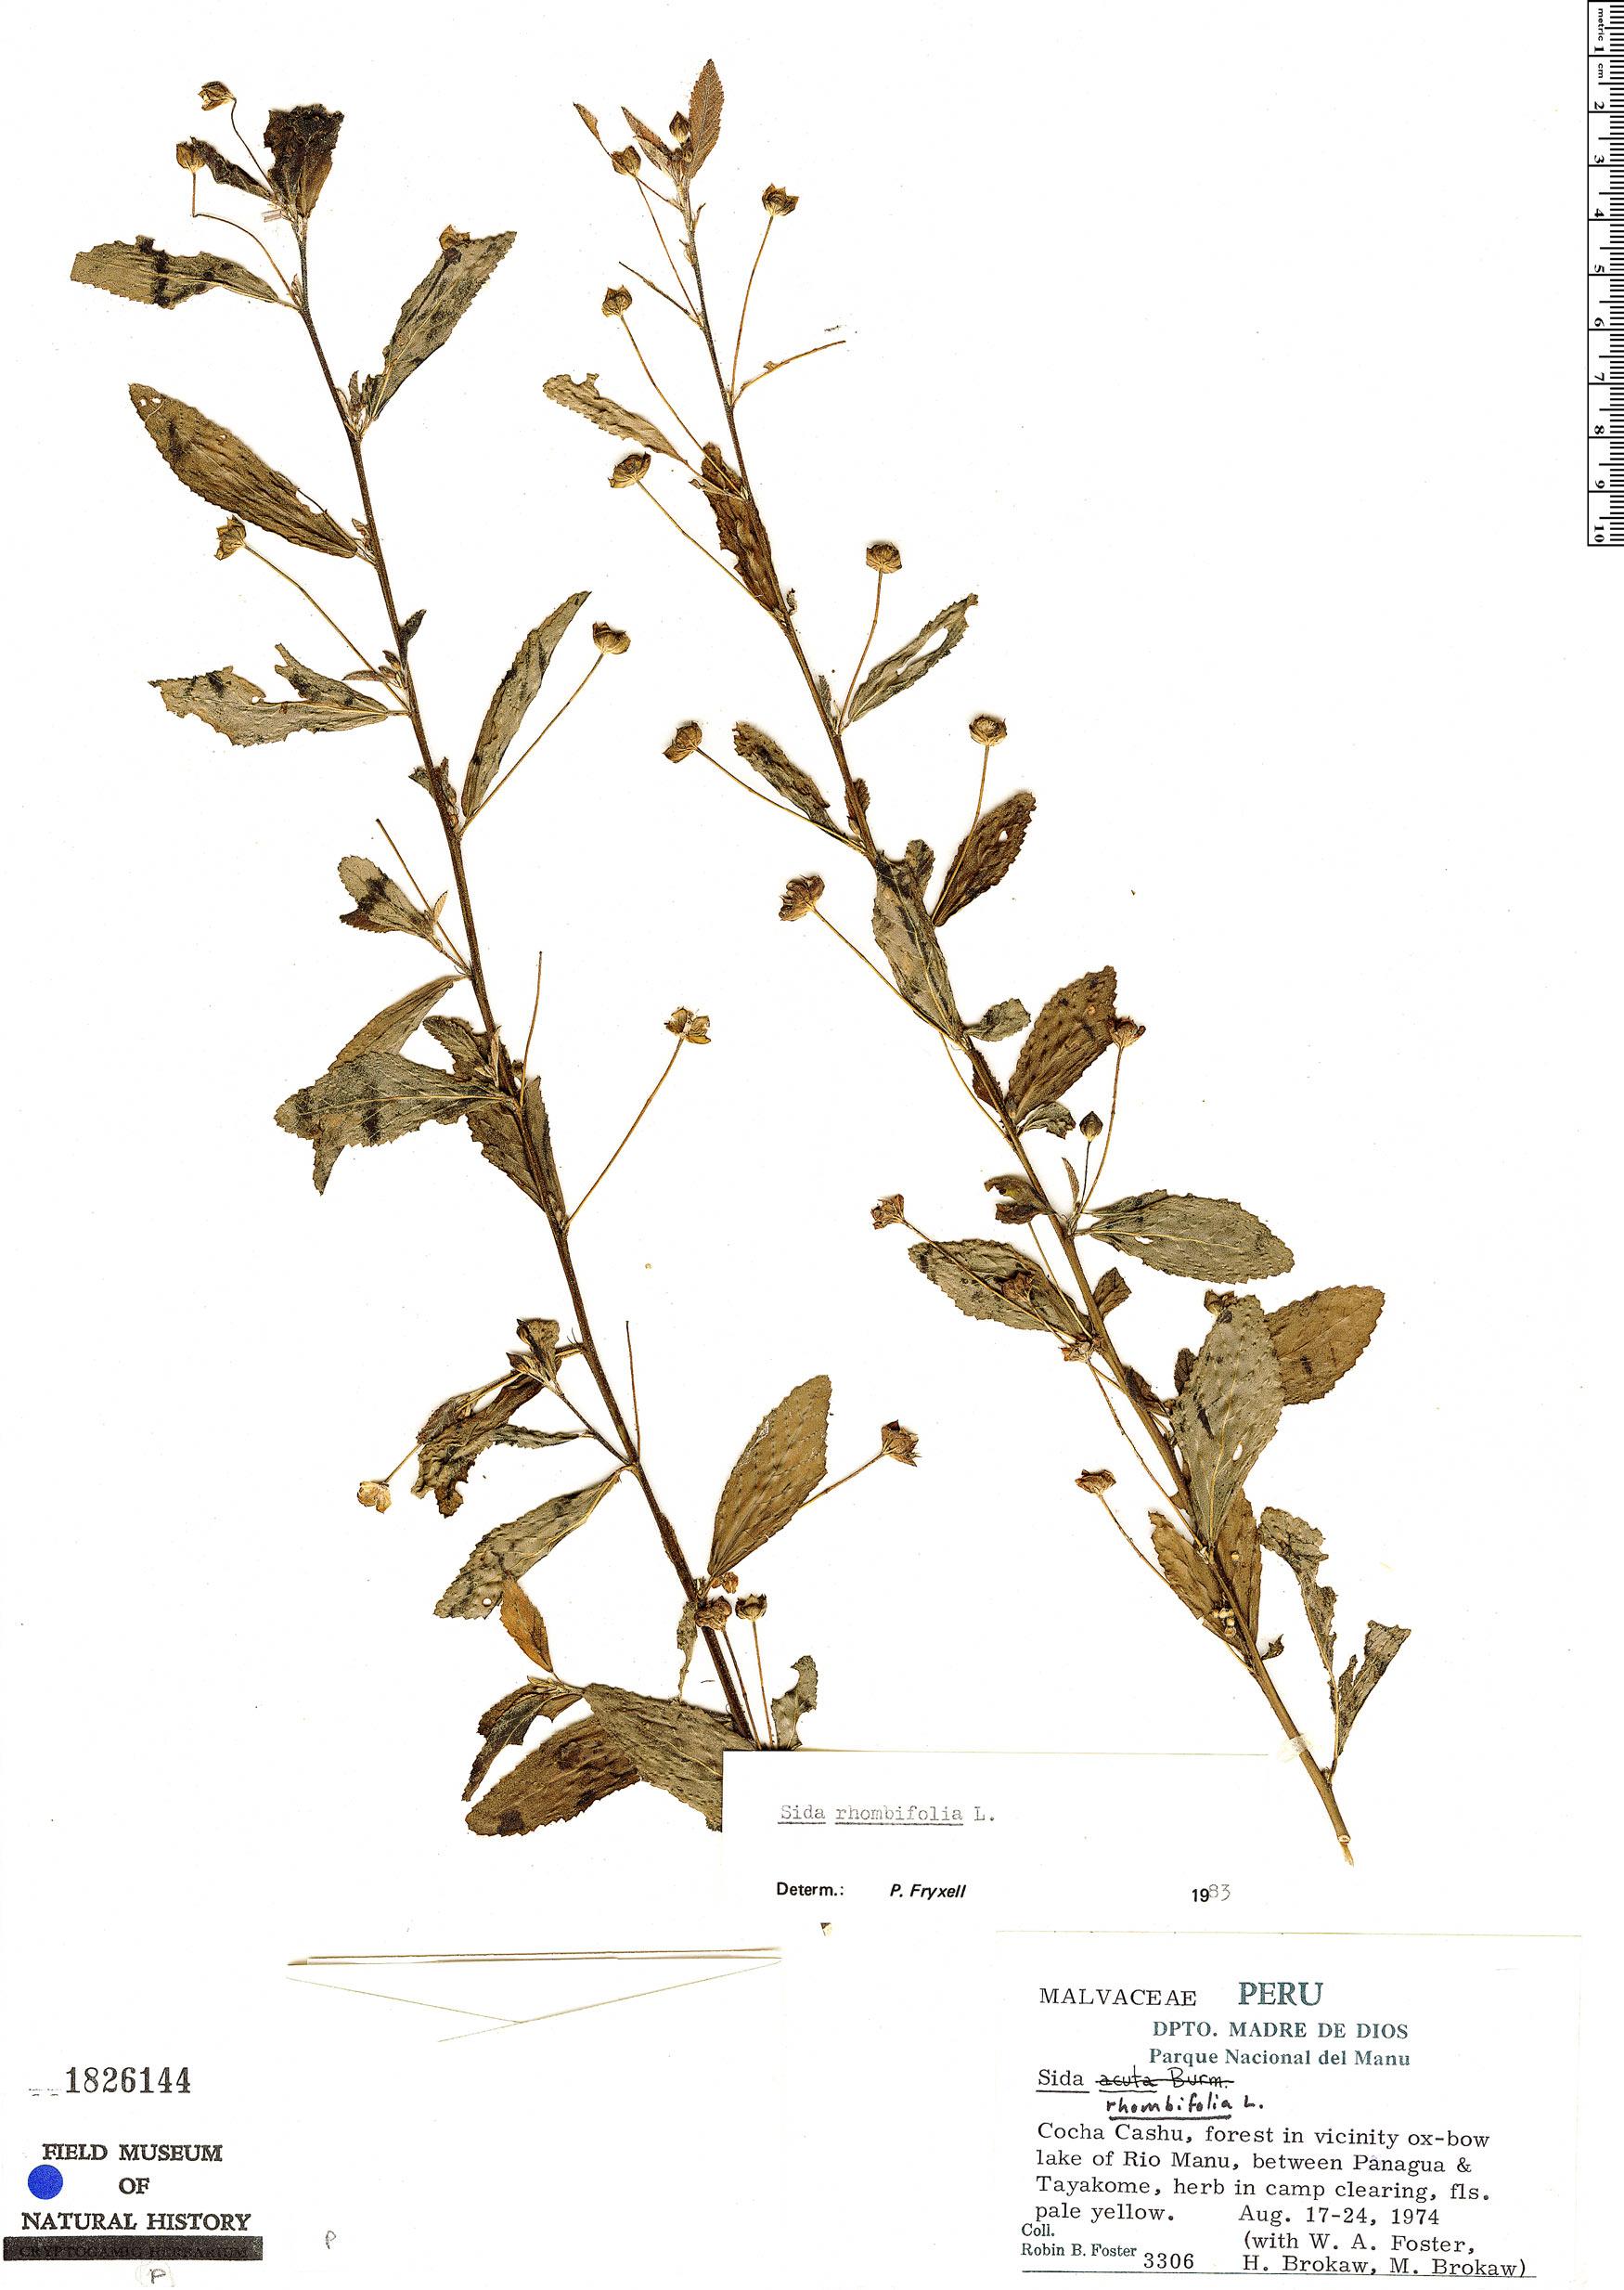 Specimen: Sida rhombifolia